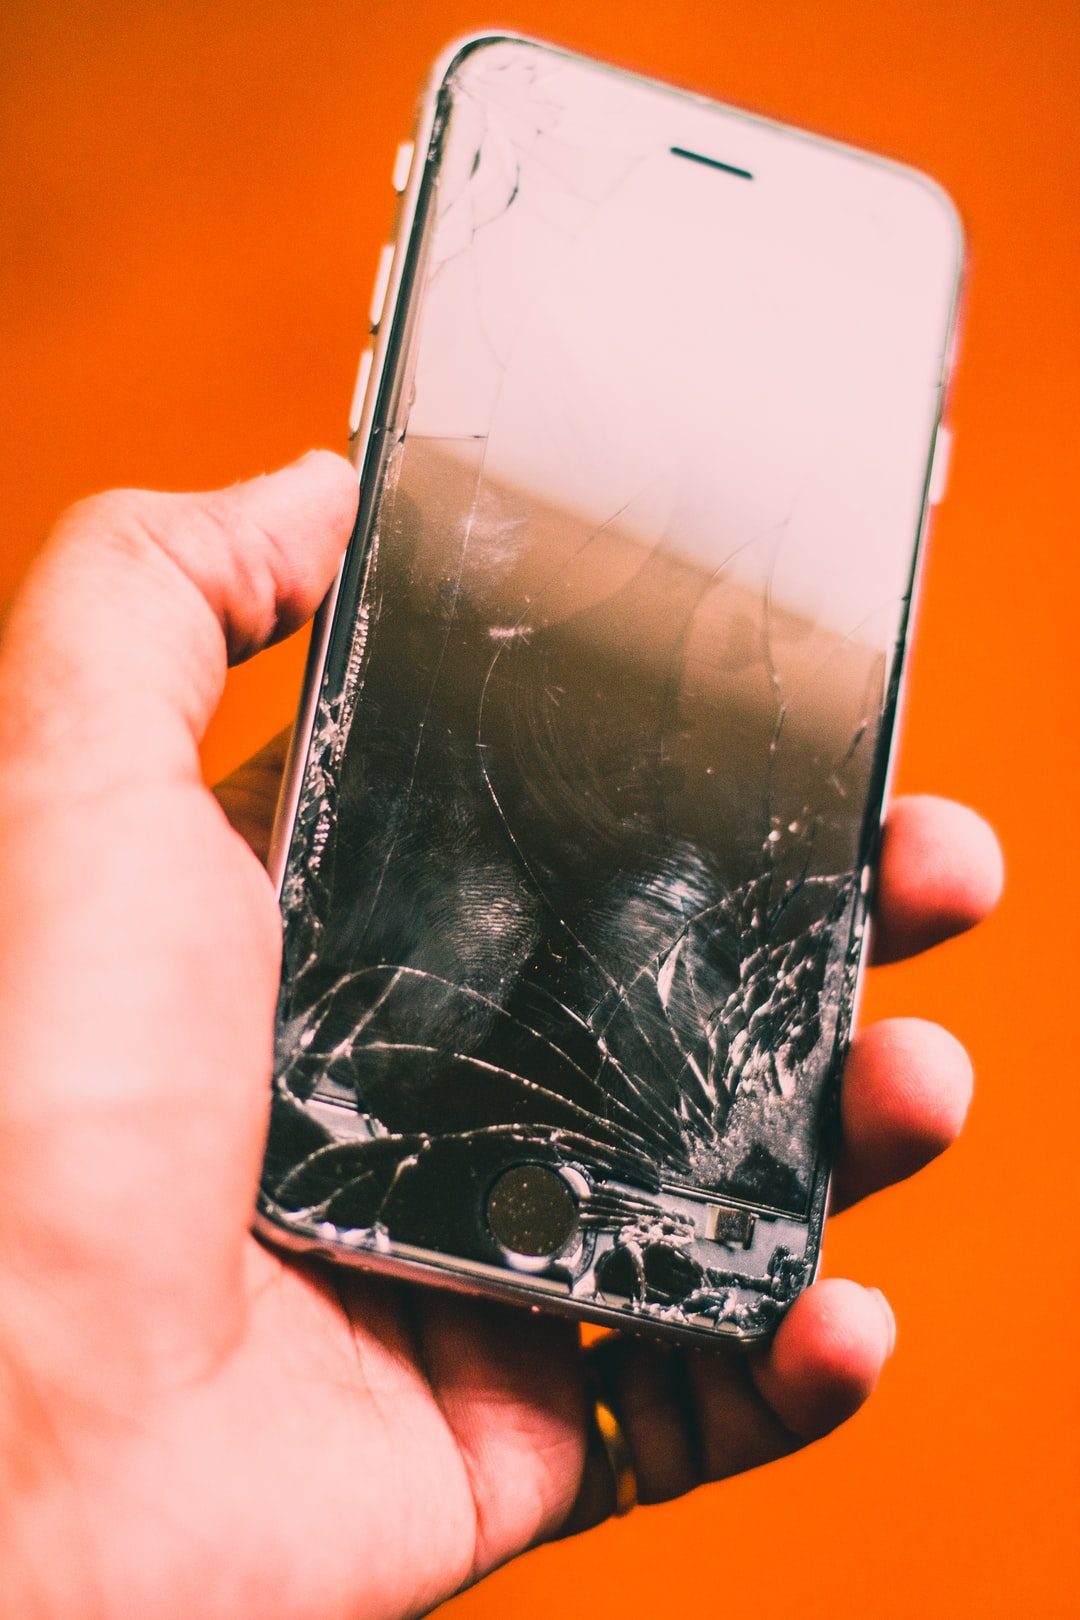 Distraction Free Homescreen - May 2019